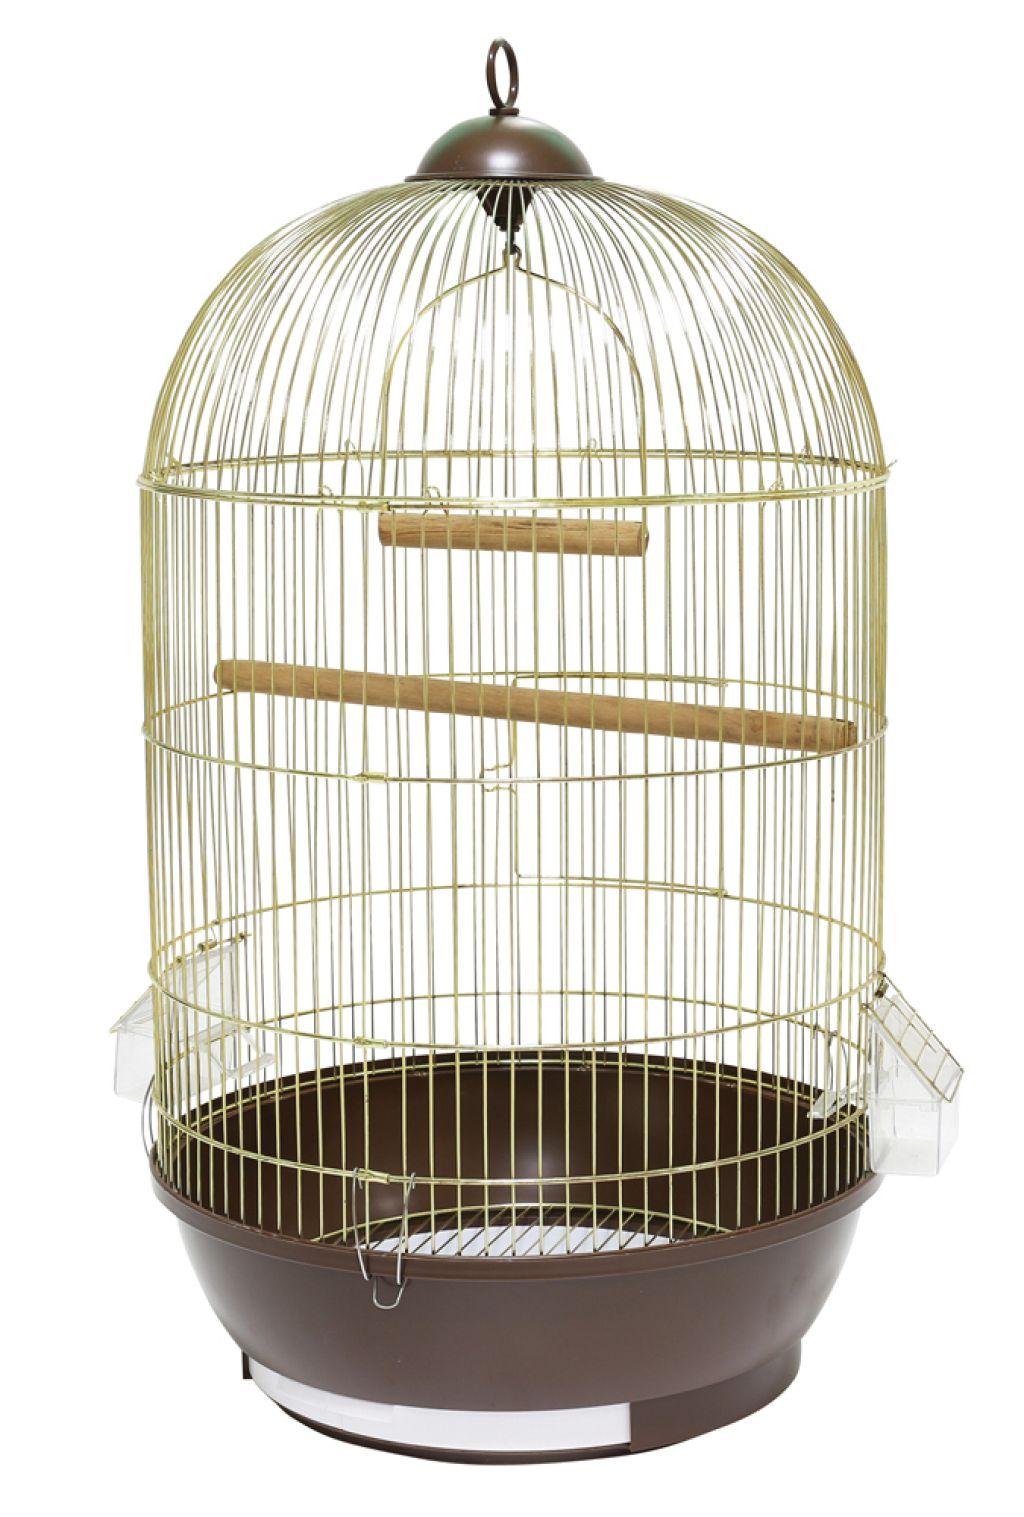 Vitapol Klatka dla ptaków